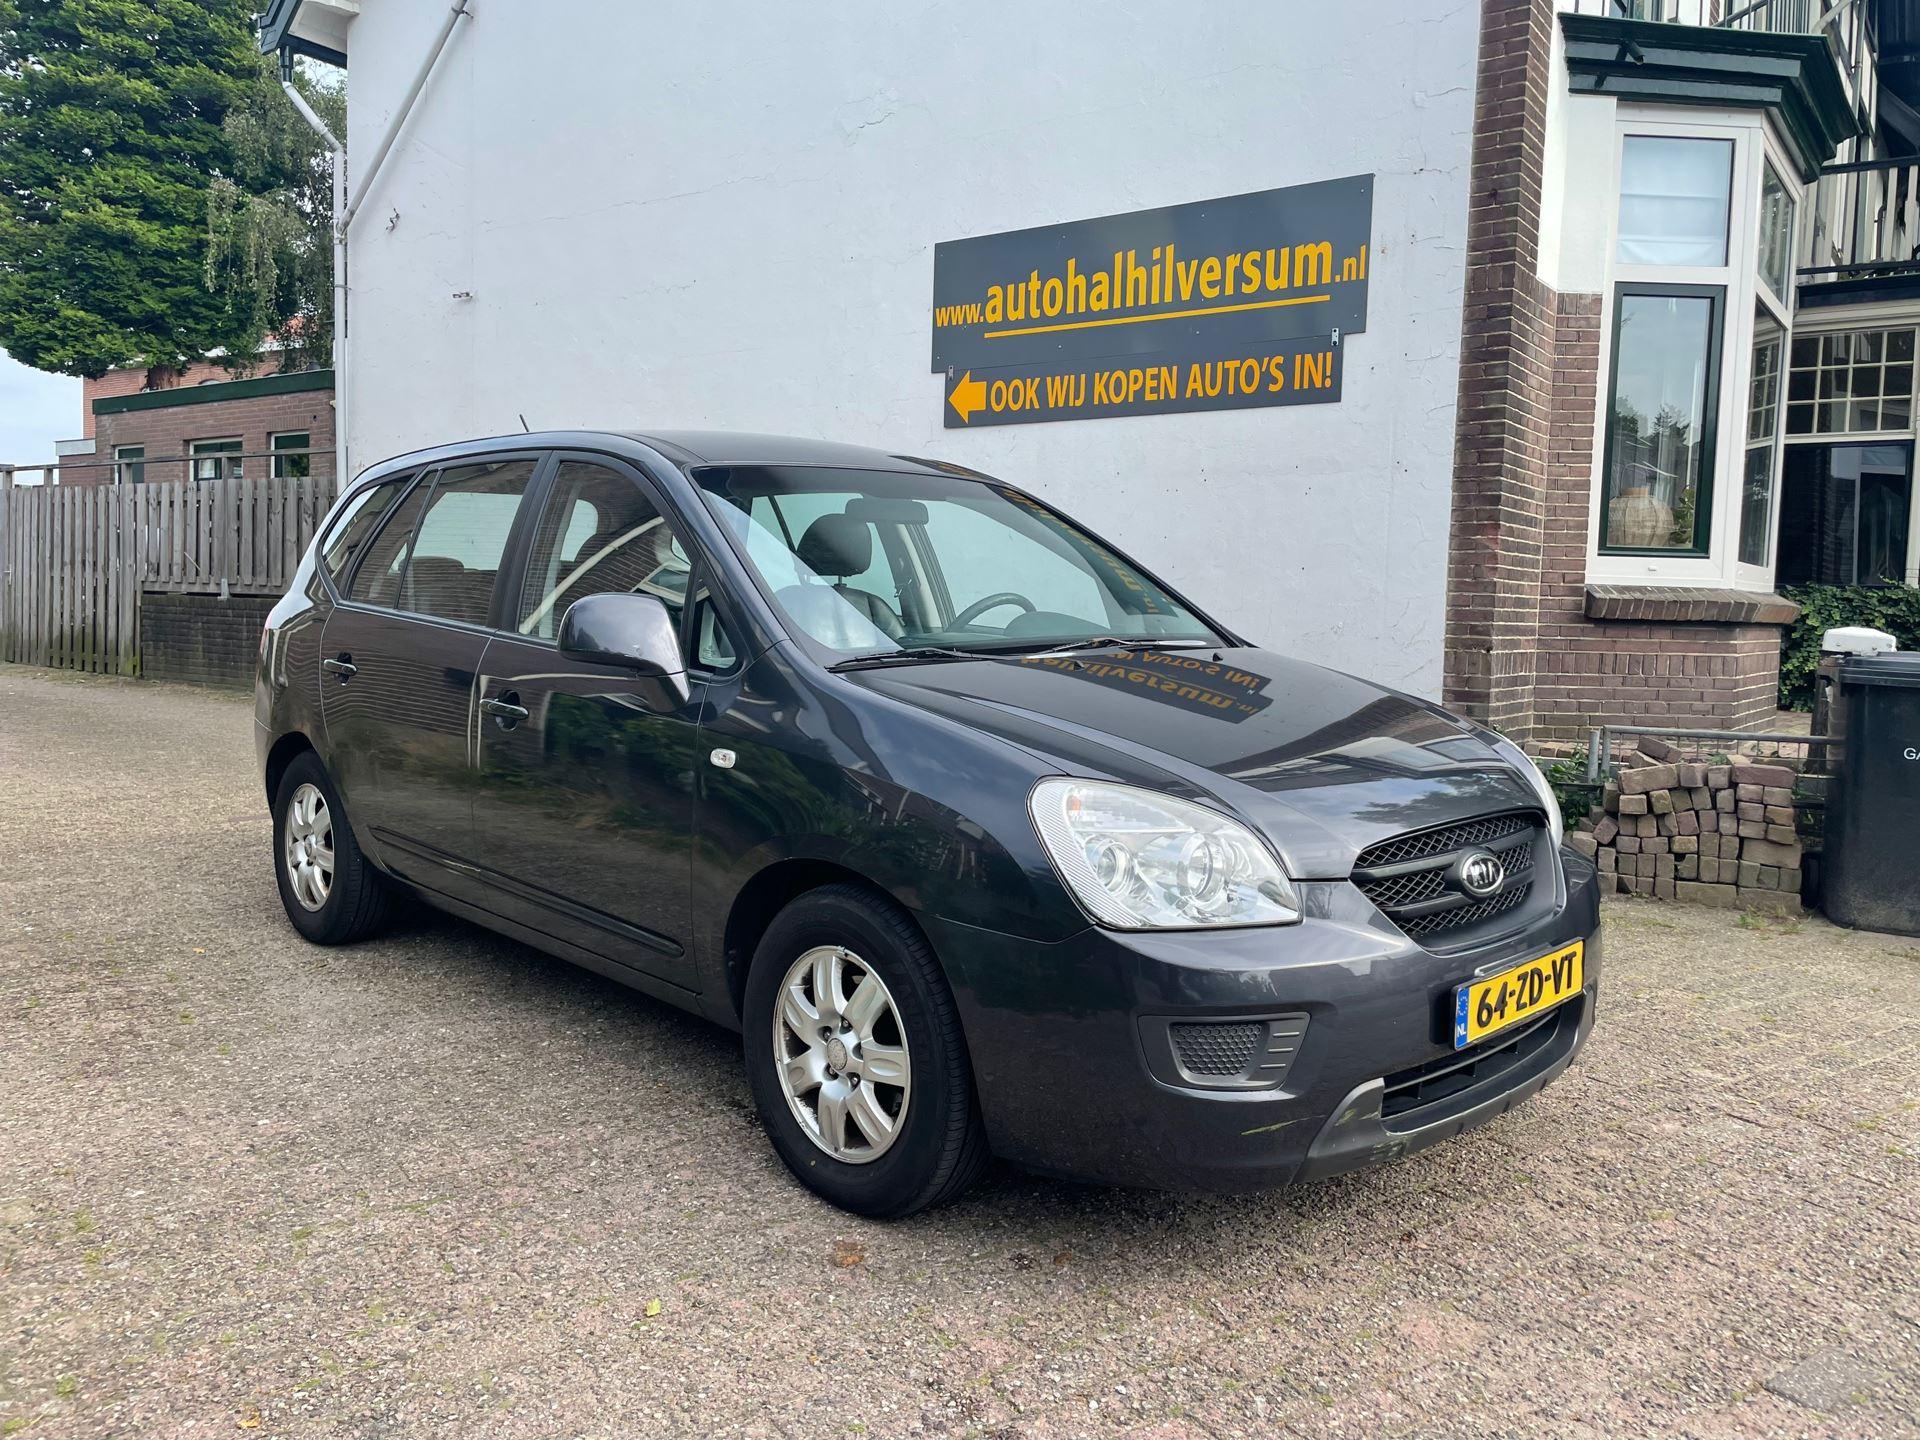 Kia Carens occasion - Autohal Hilversum